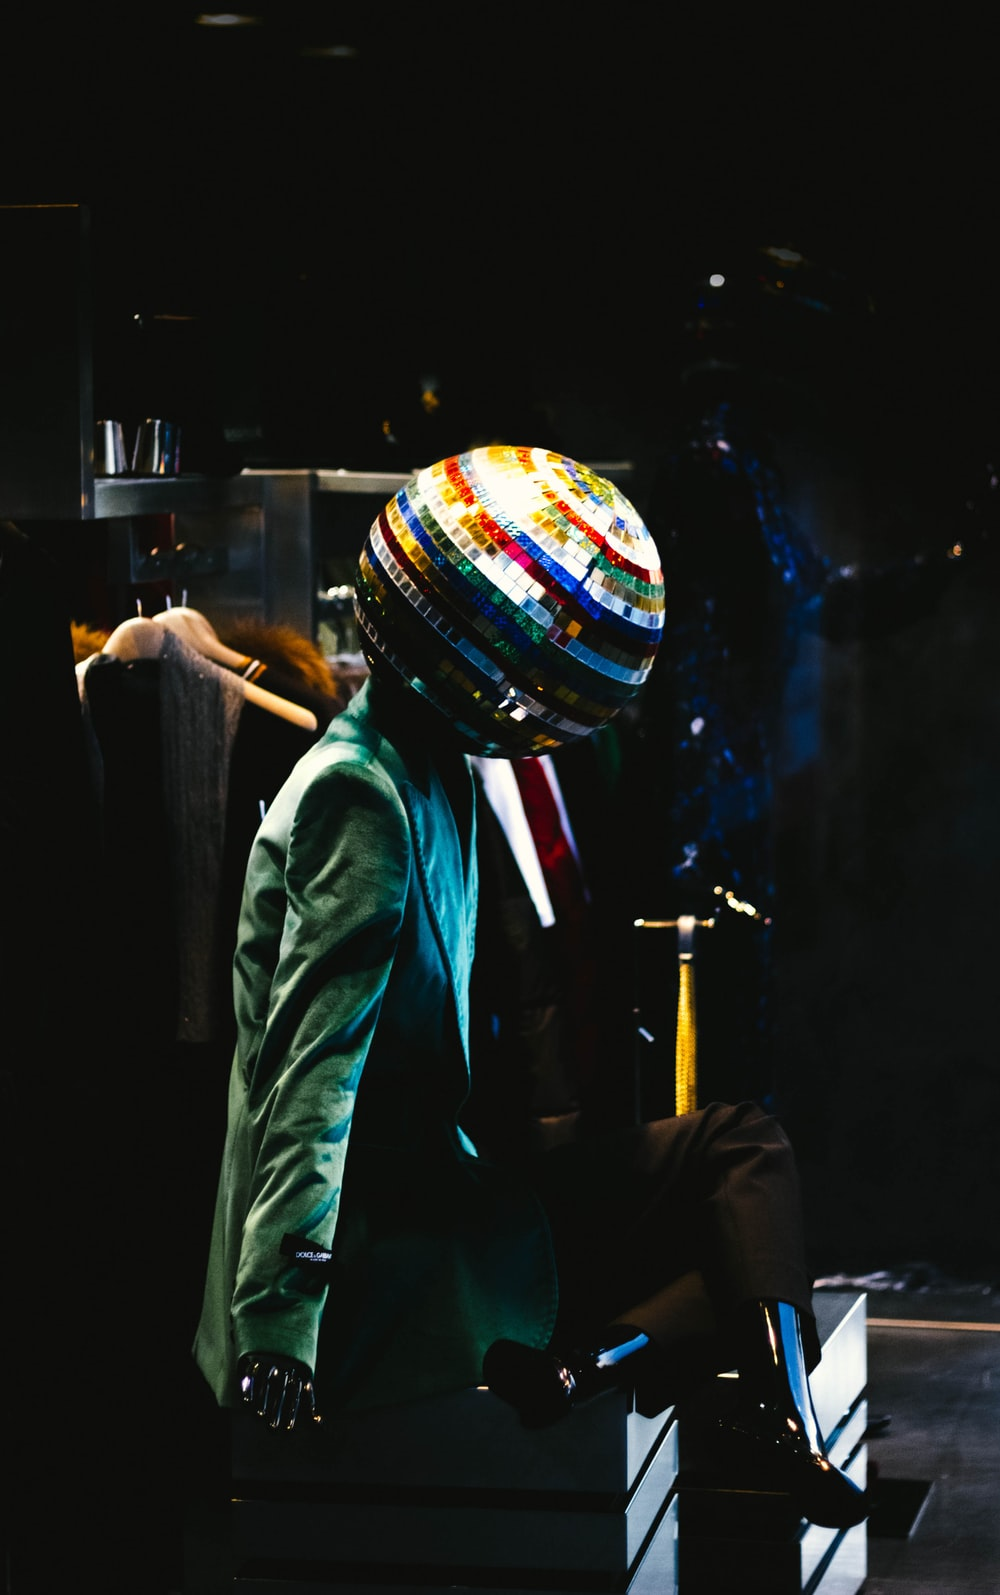 person wearing green blazer and disco ball head costume